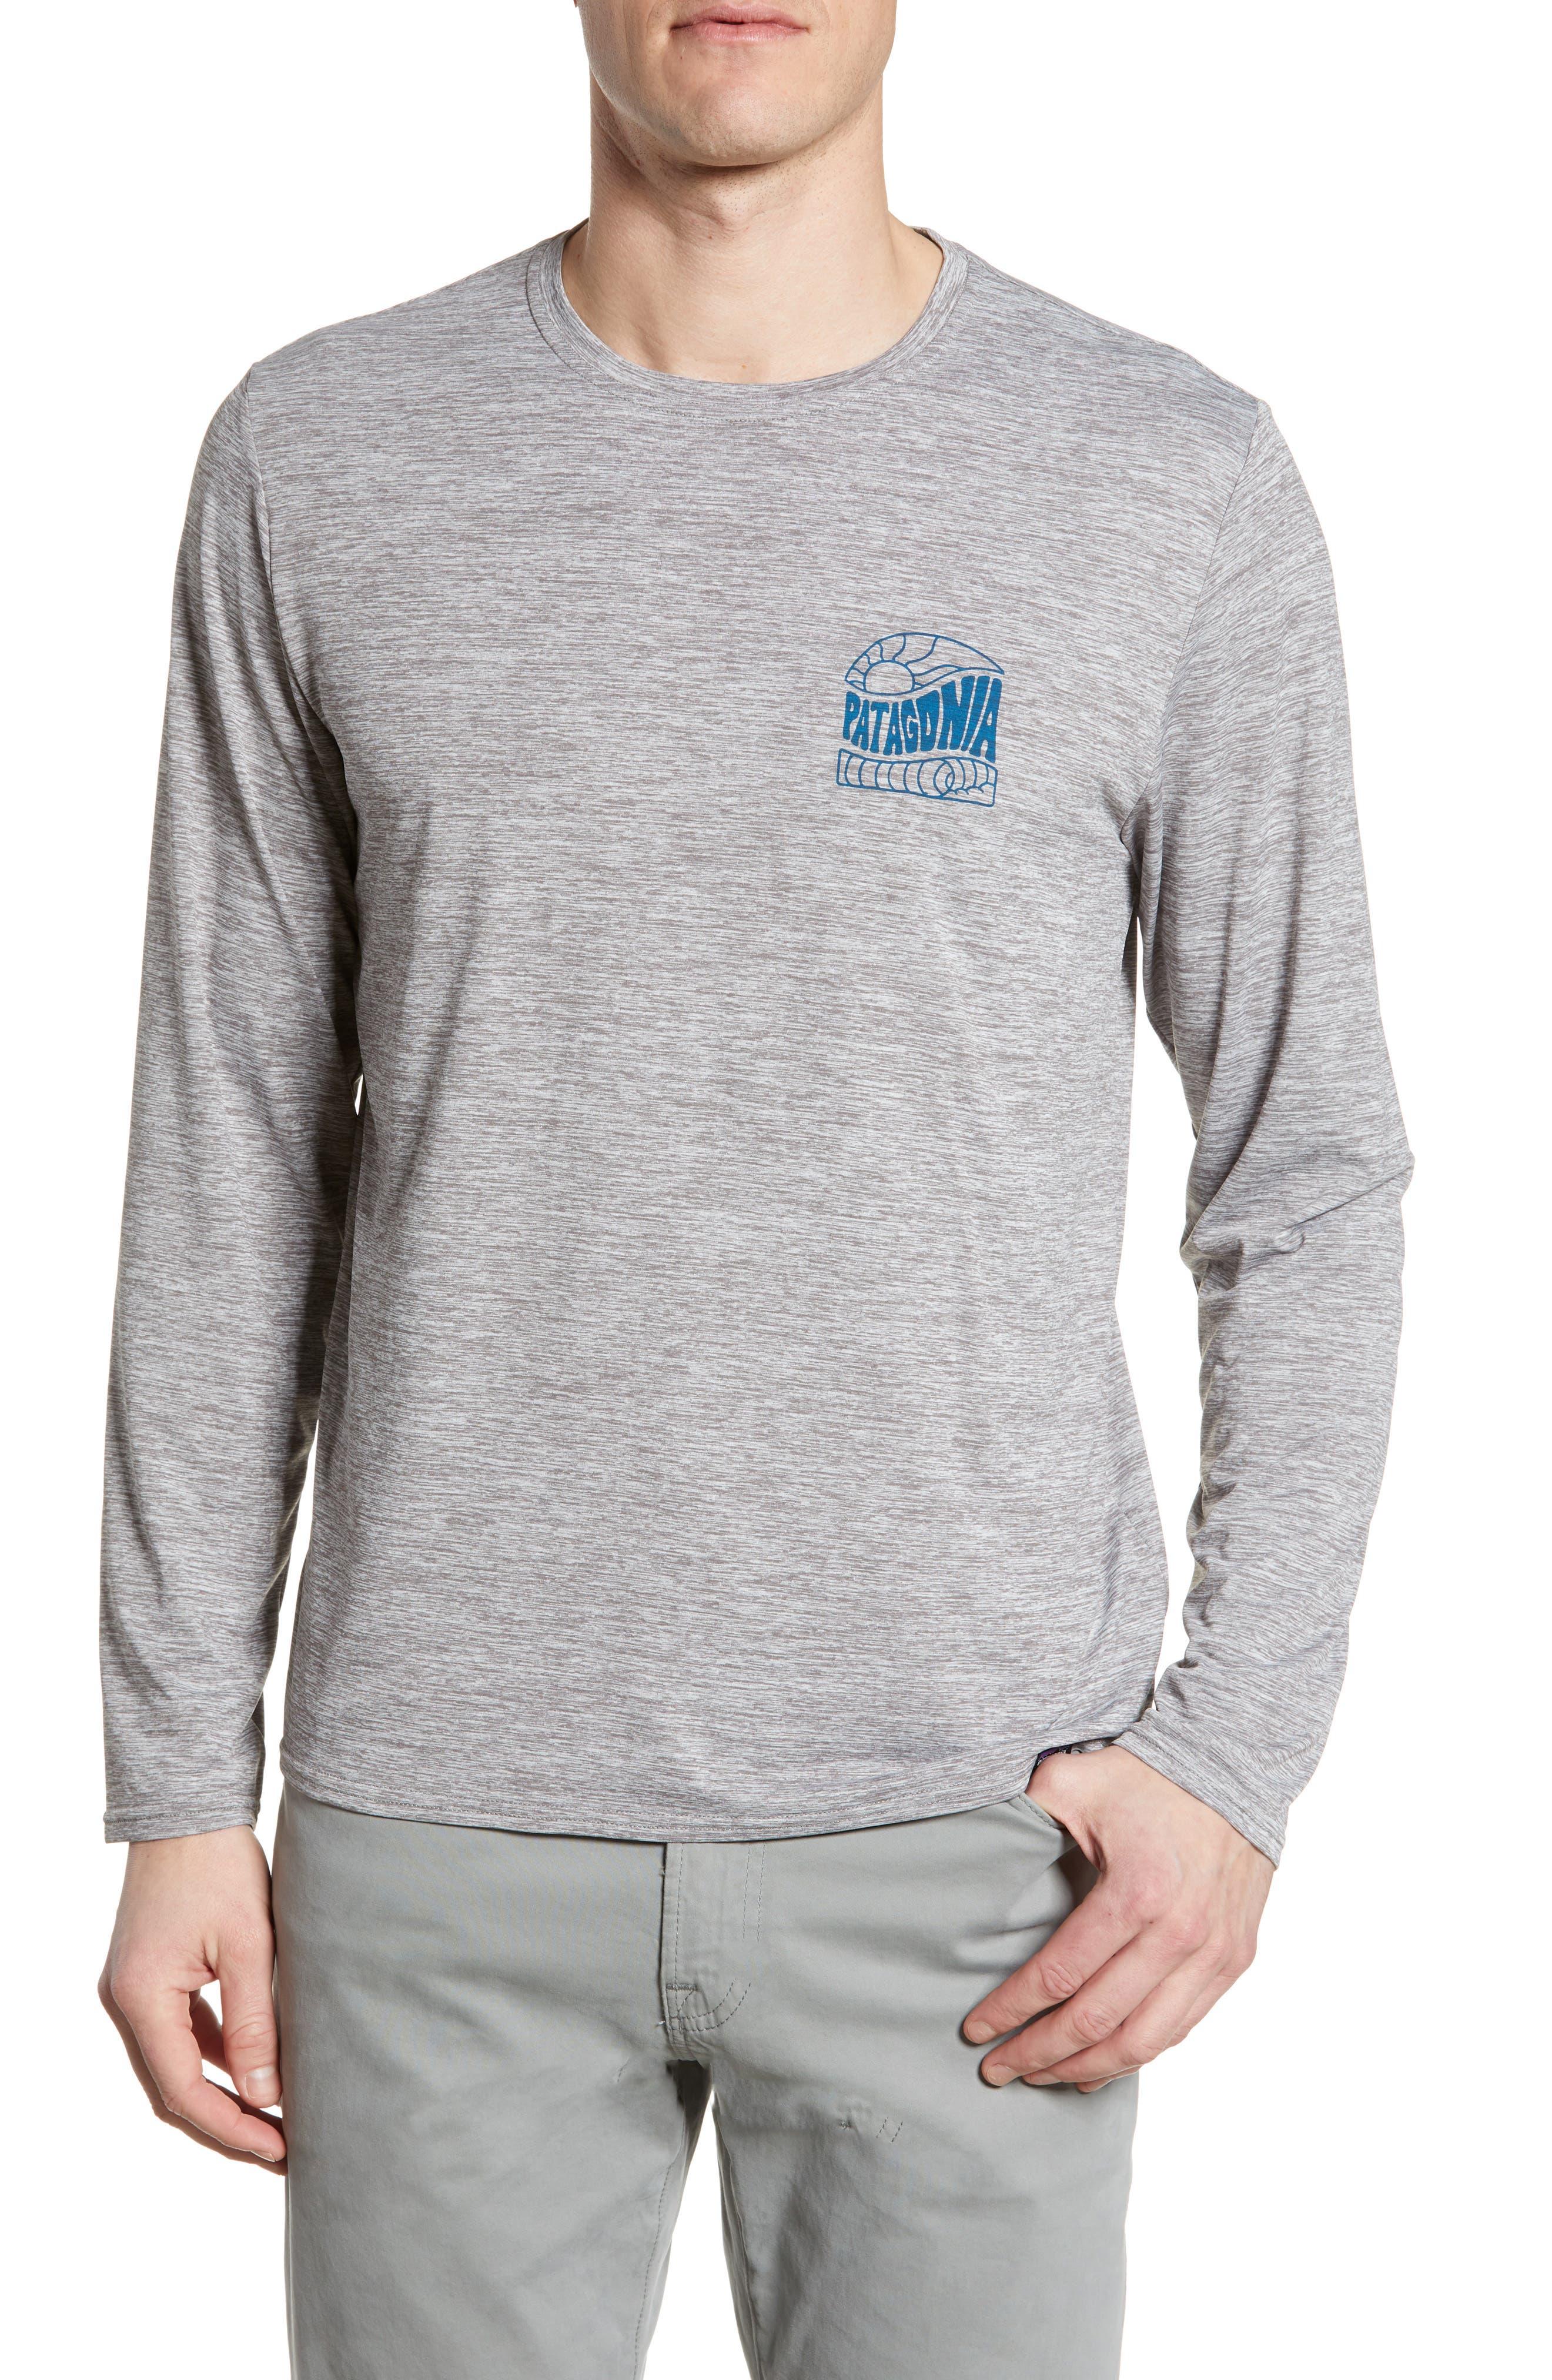 Patagonia Capilene Cool Daily Long Sleeve T-Shirt, Grey